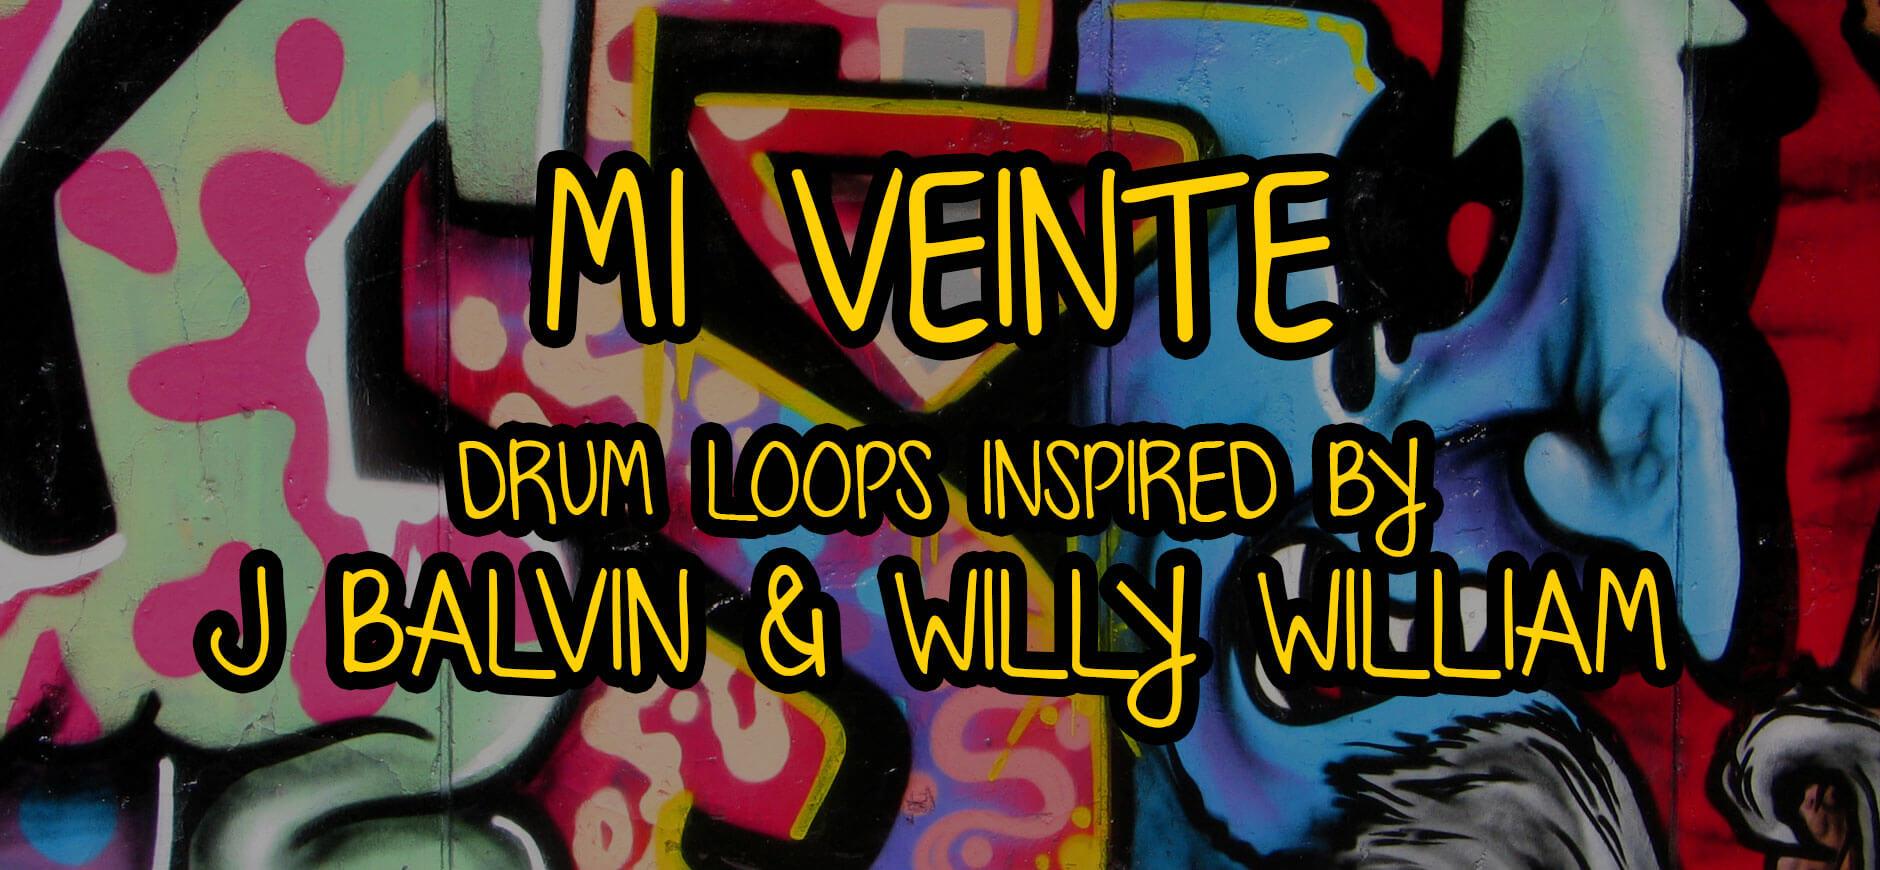 Mi Gente Drum Loops Inspired by J Balvin & Willy William